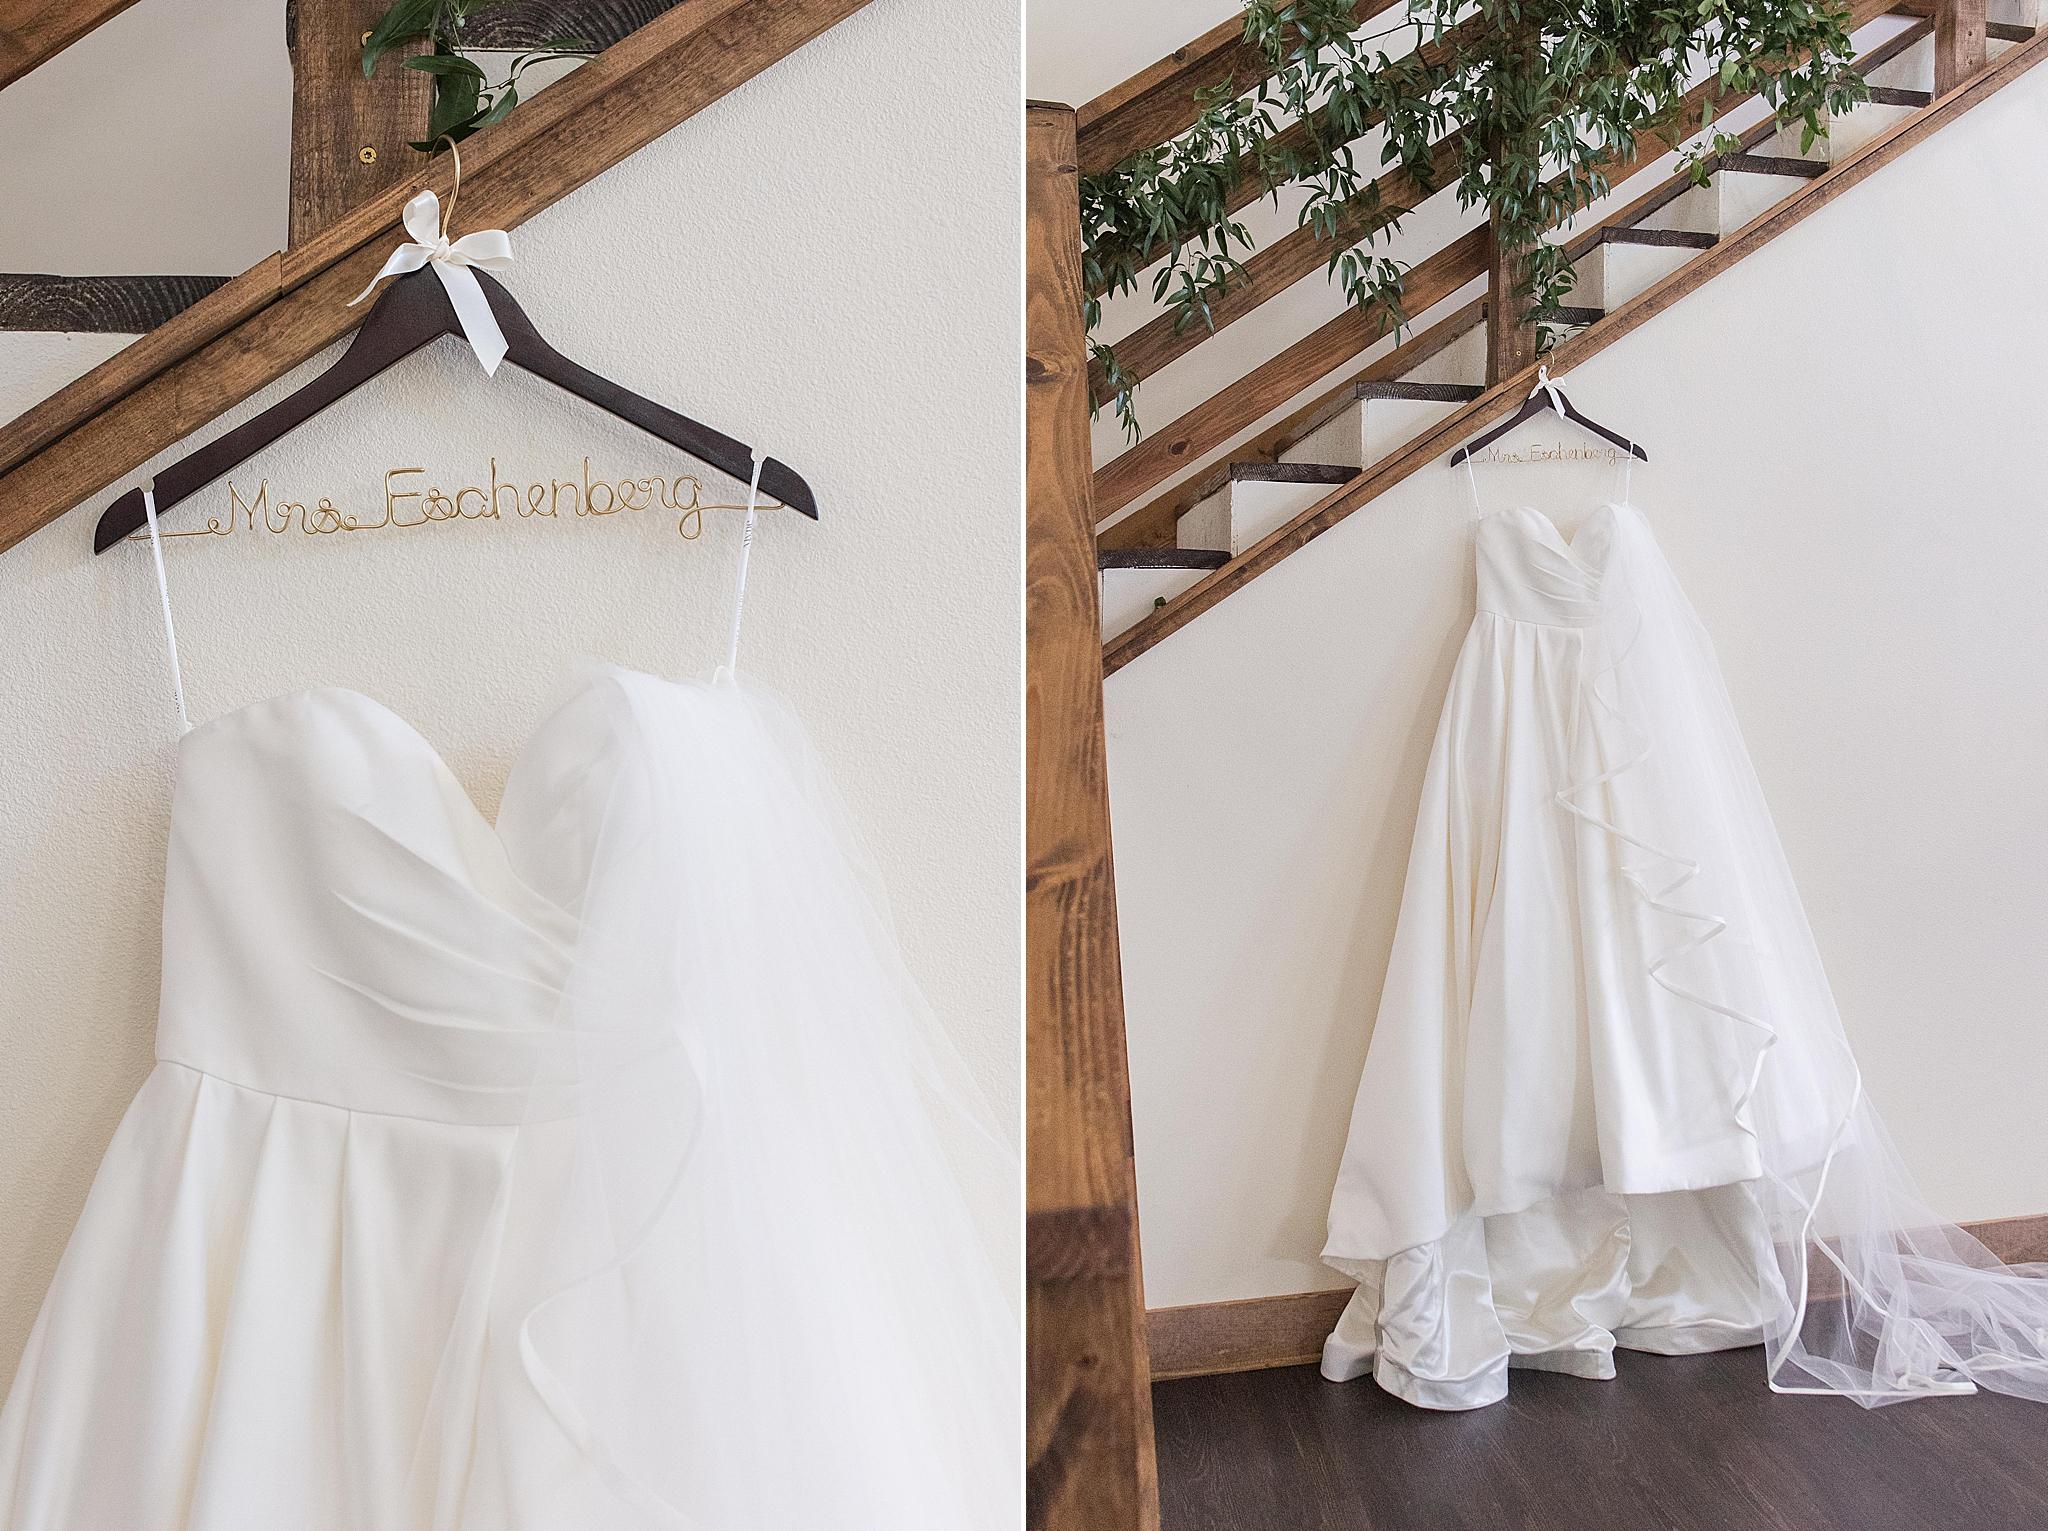 bridal gown hangs in bridal suite at Izenstone